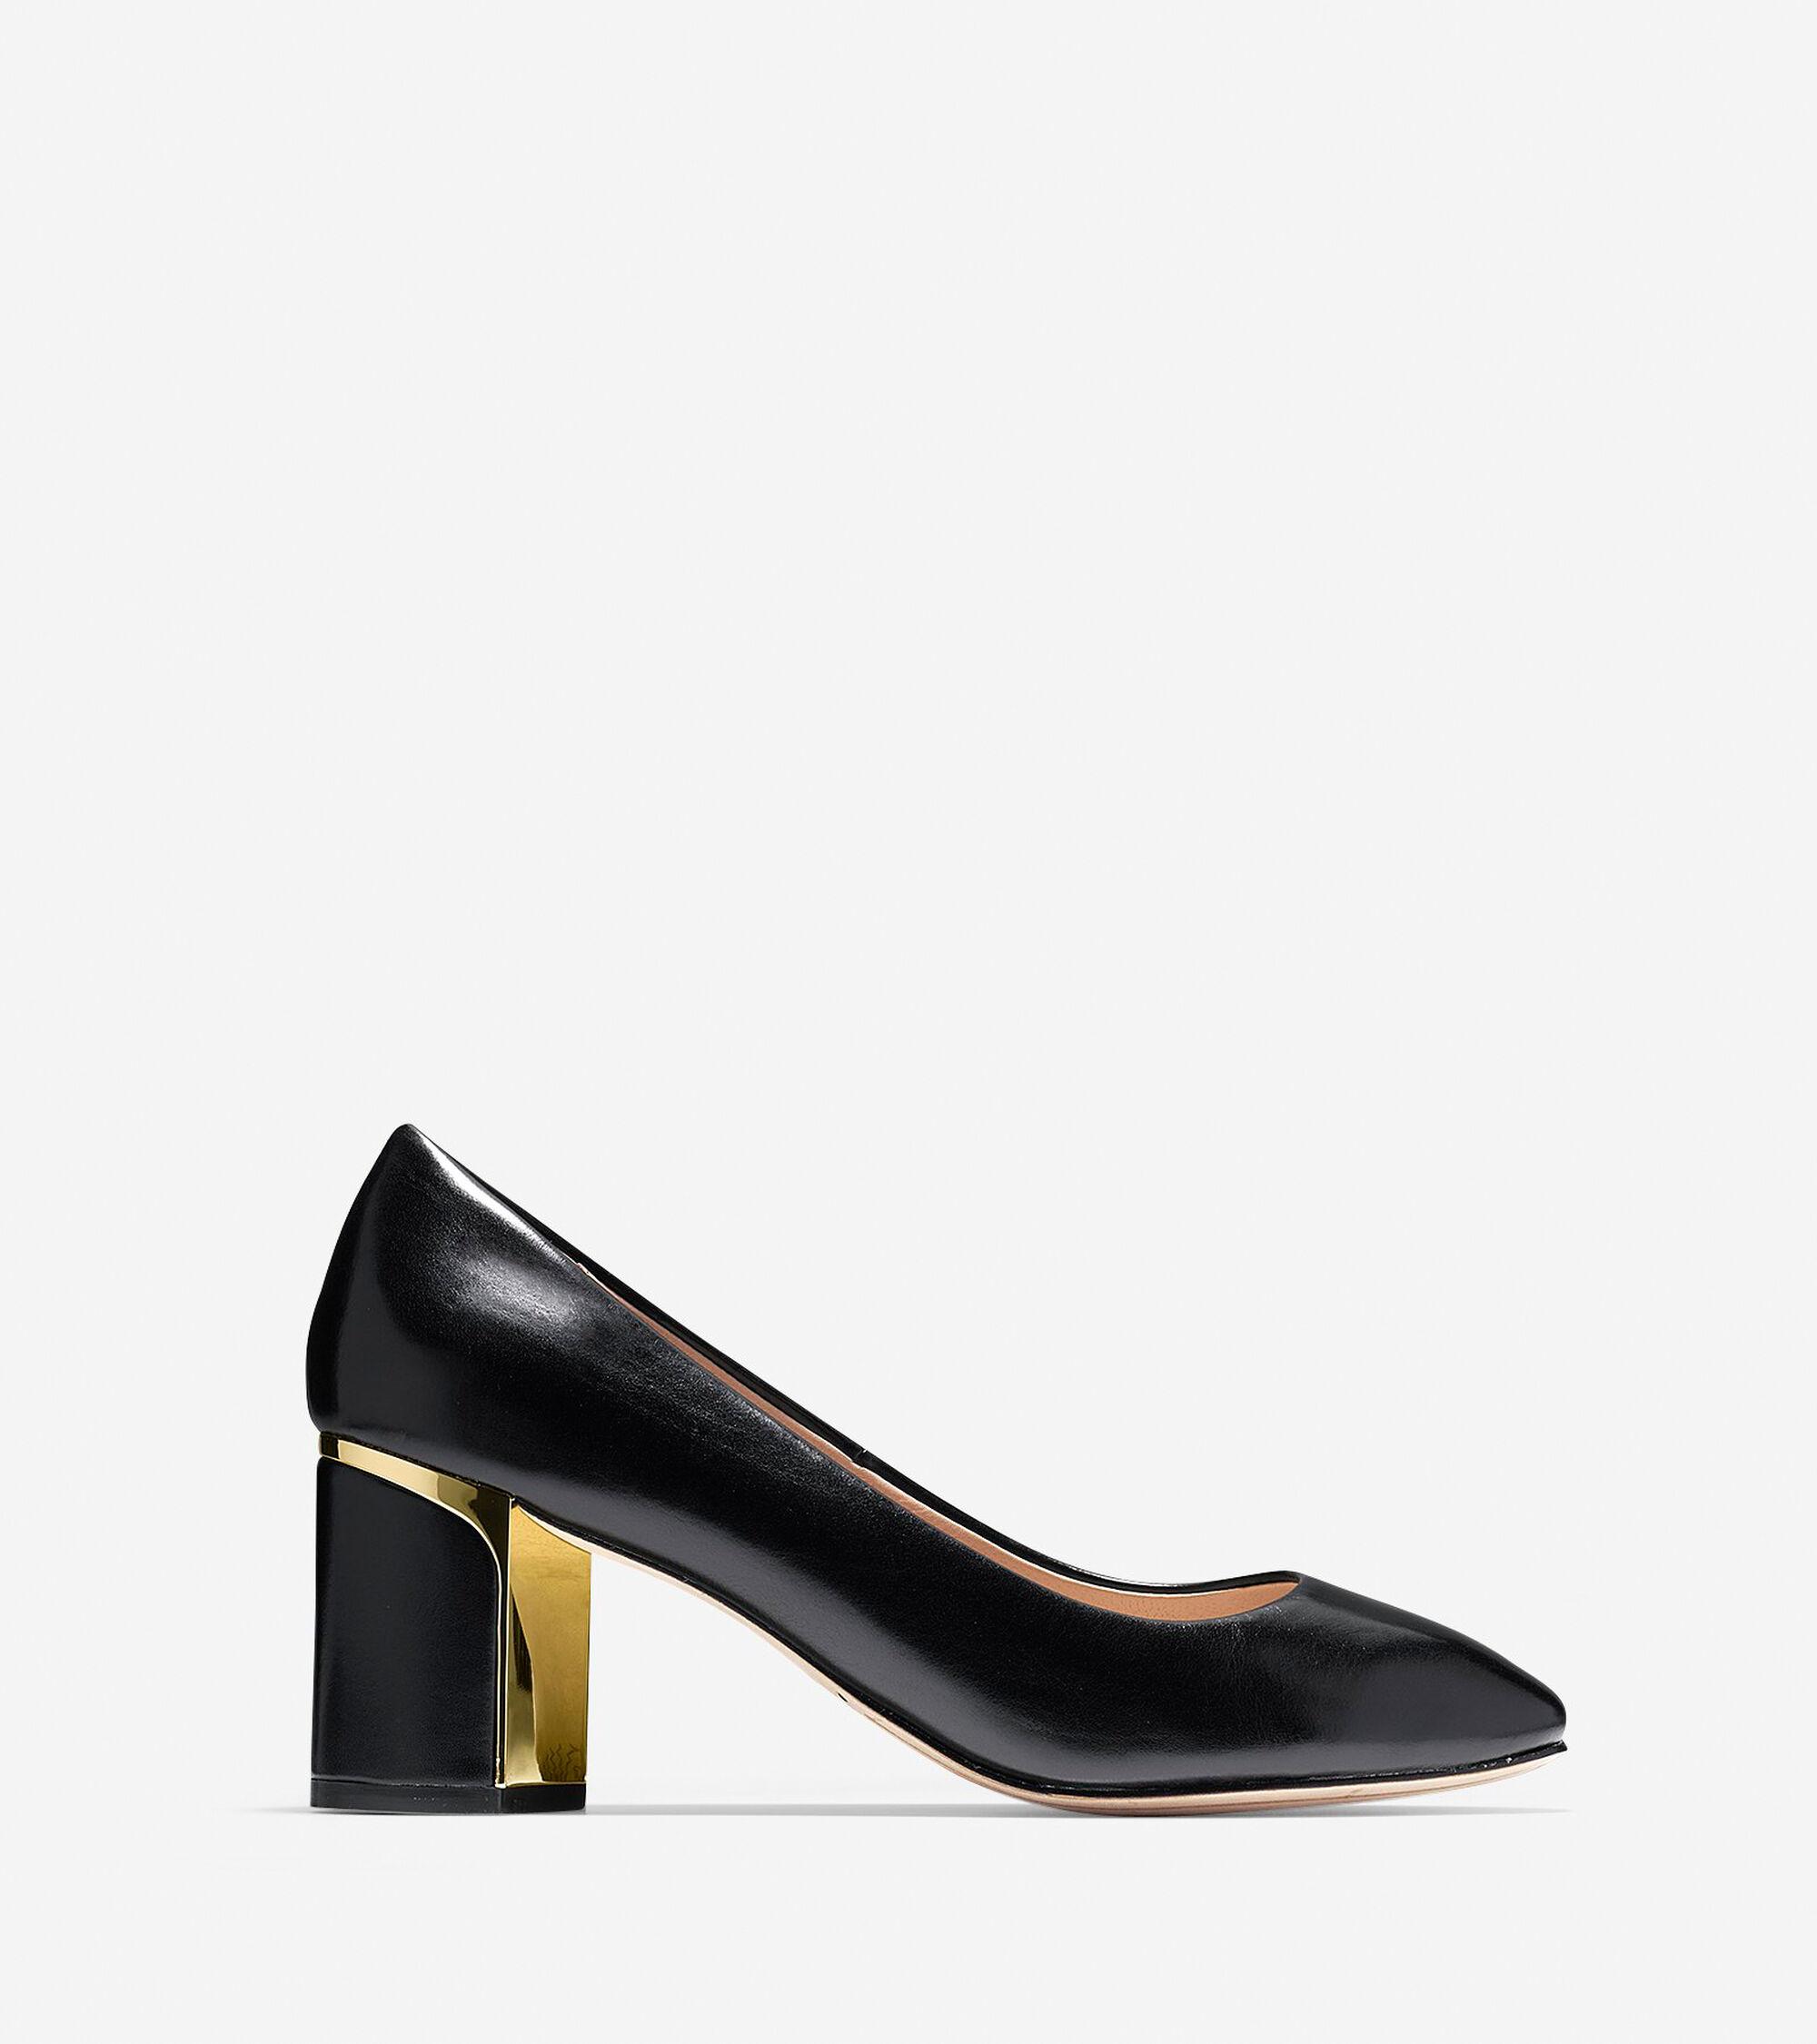 a937121091d Women s Collection Block Heel Pumps 65mm in Black